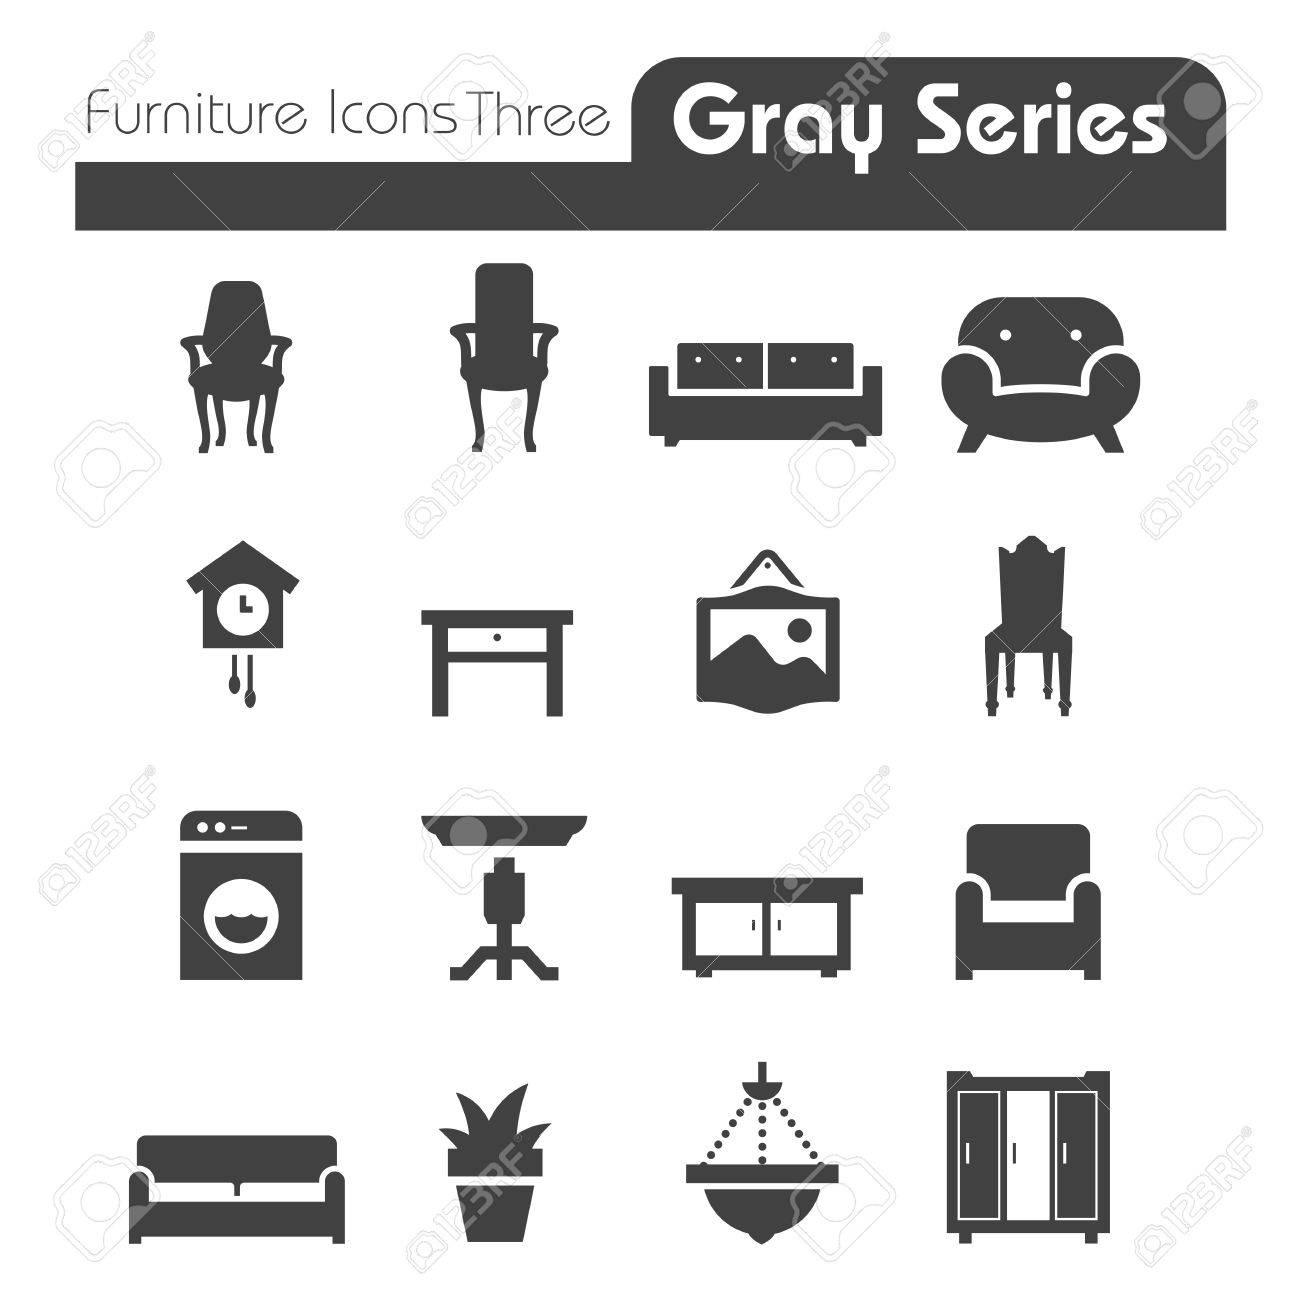 Furniture Icons gray series Three - 27357719